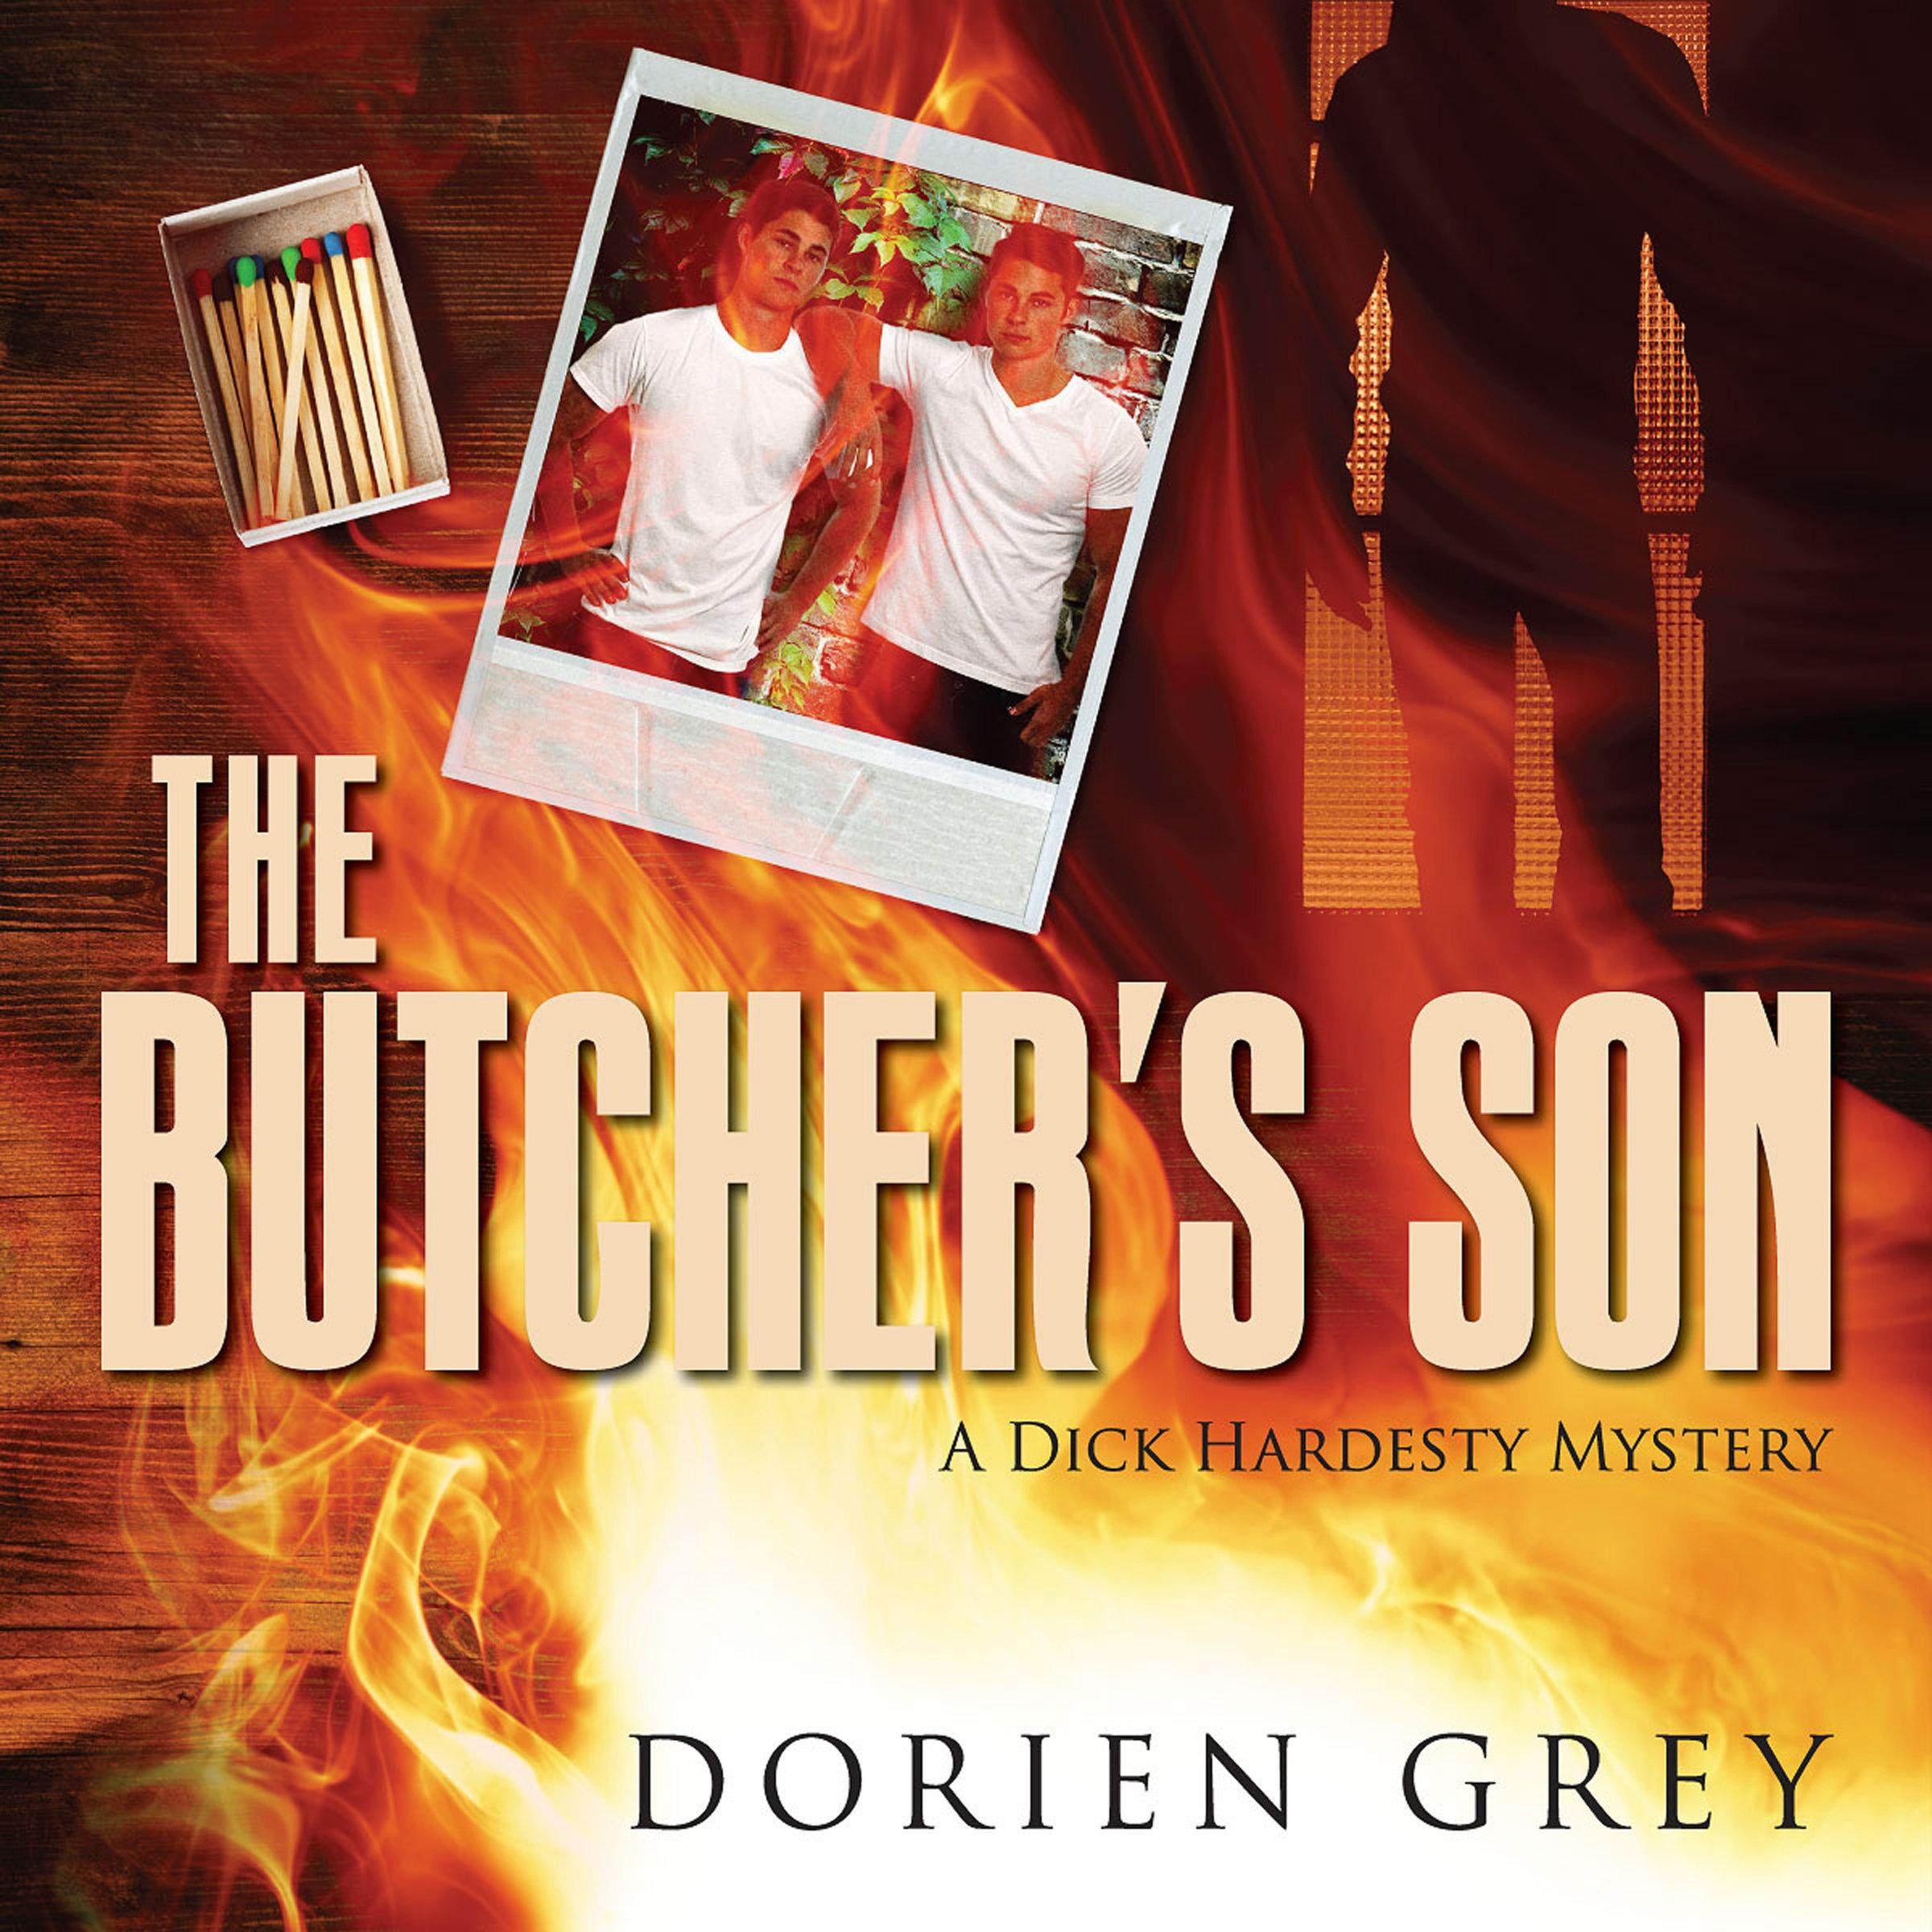 The Butcher's Son: A Dick Hardesty Mystery, Book 1